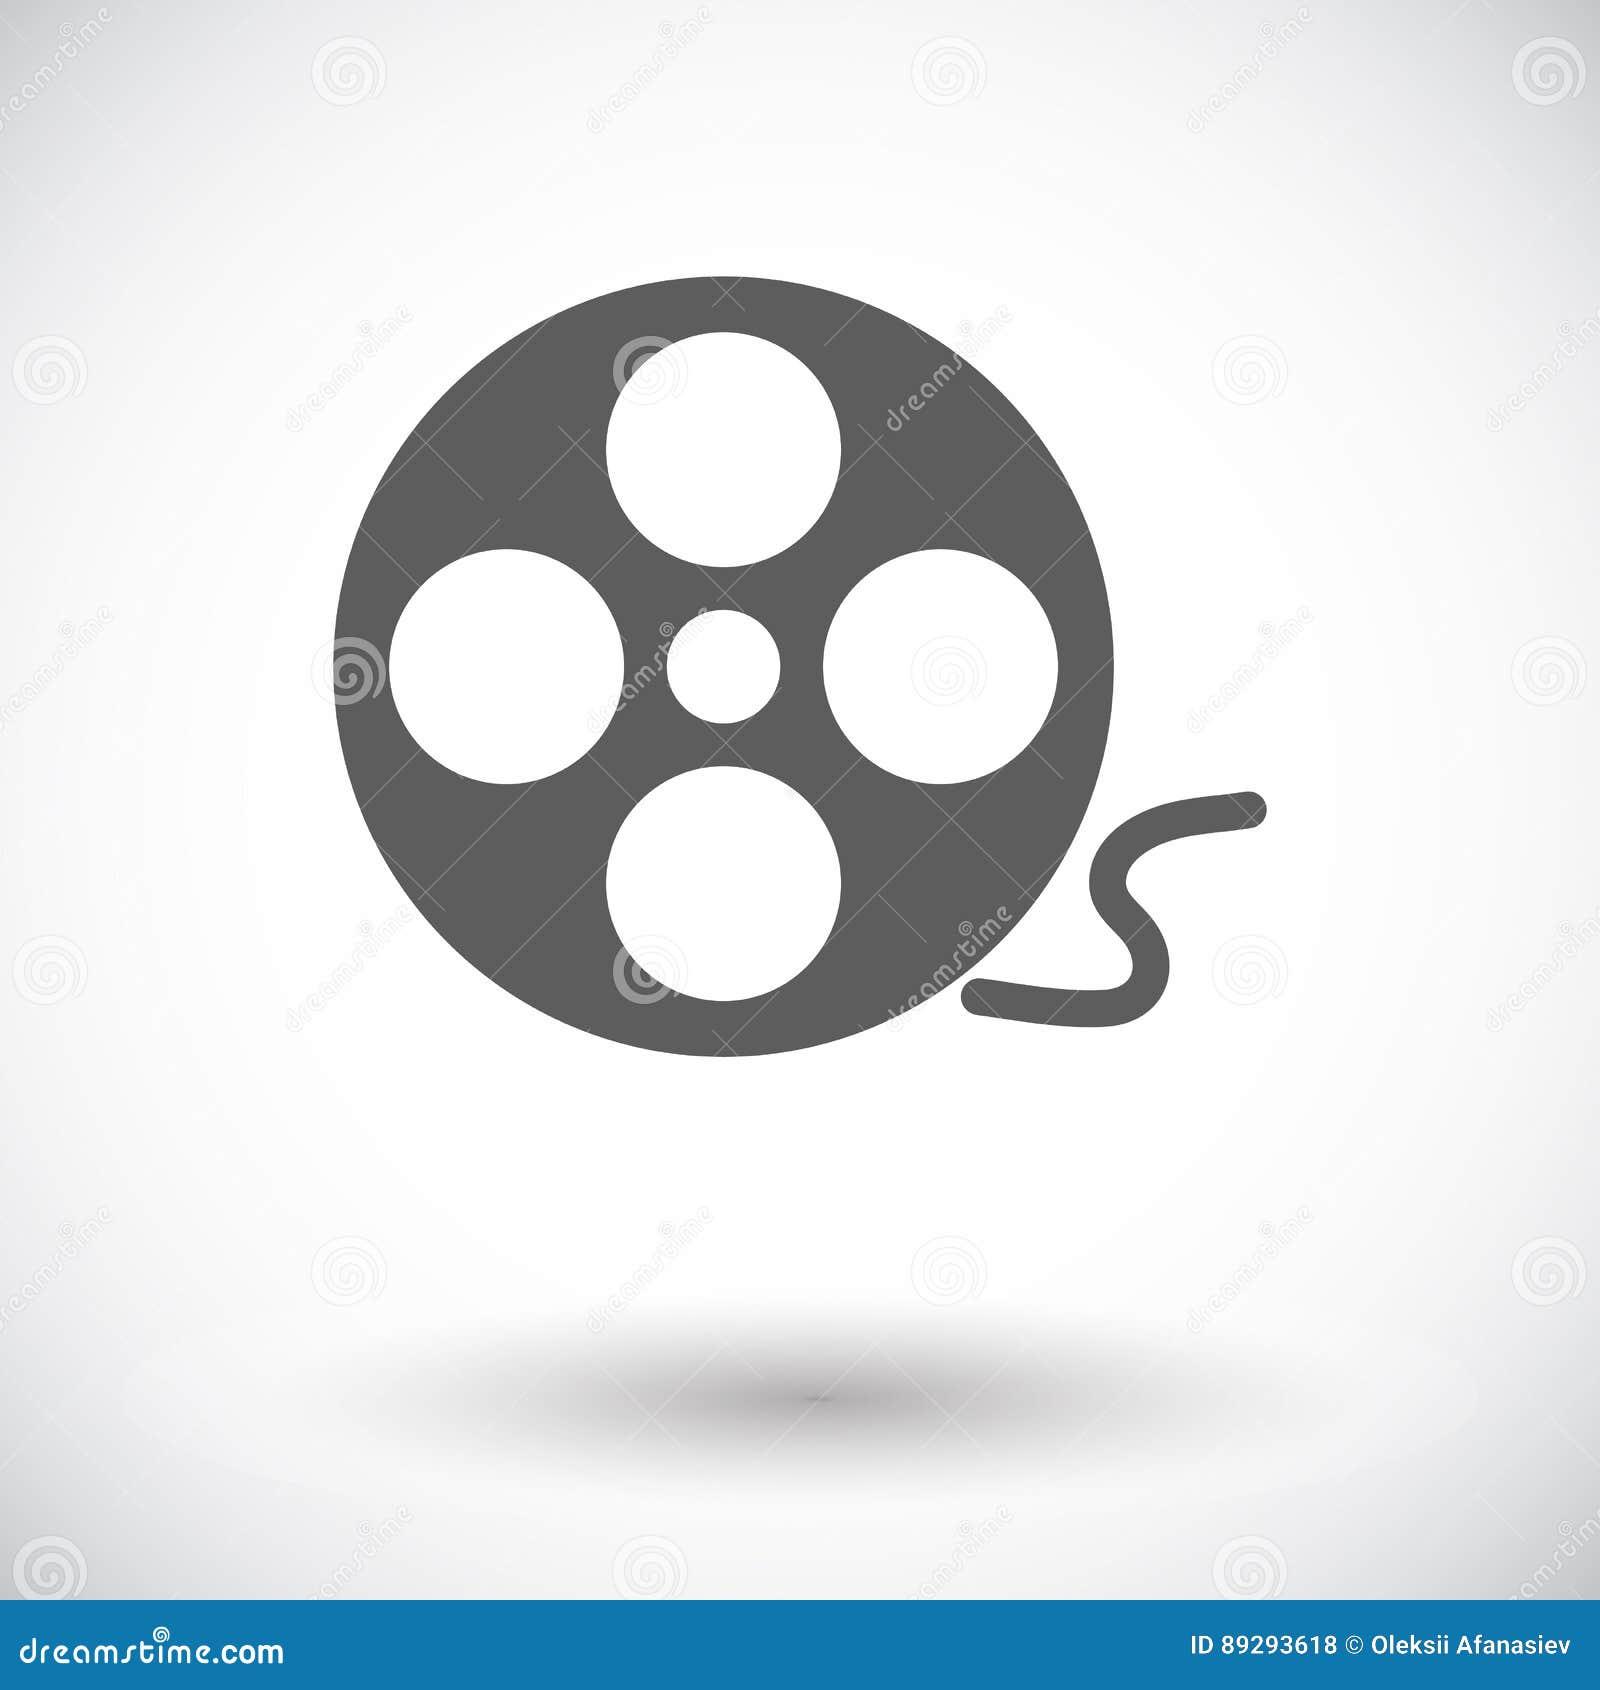 HD & 4K Burnt Blue Film Storyblocks Videos: Royalty-Free ...